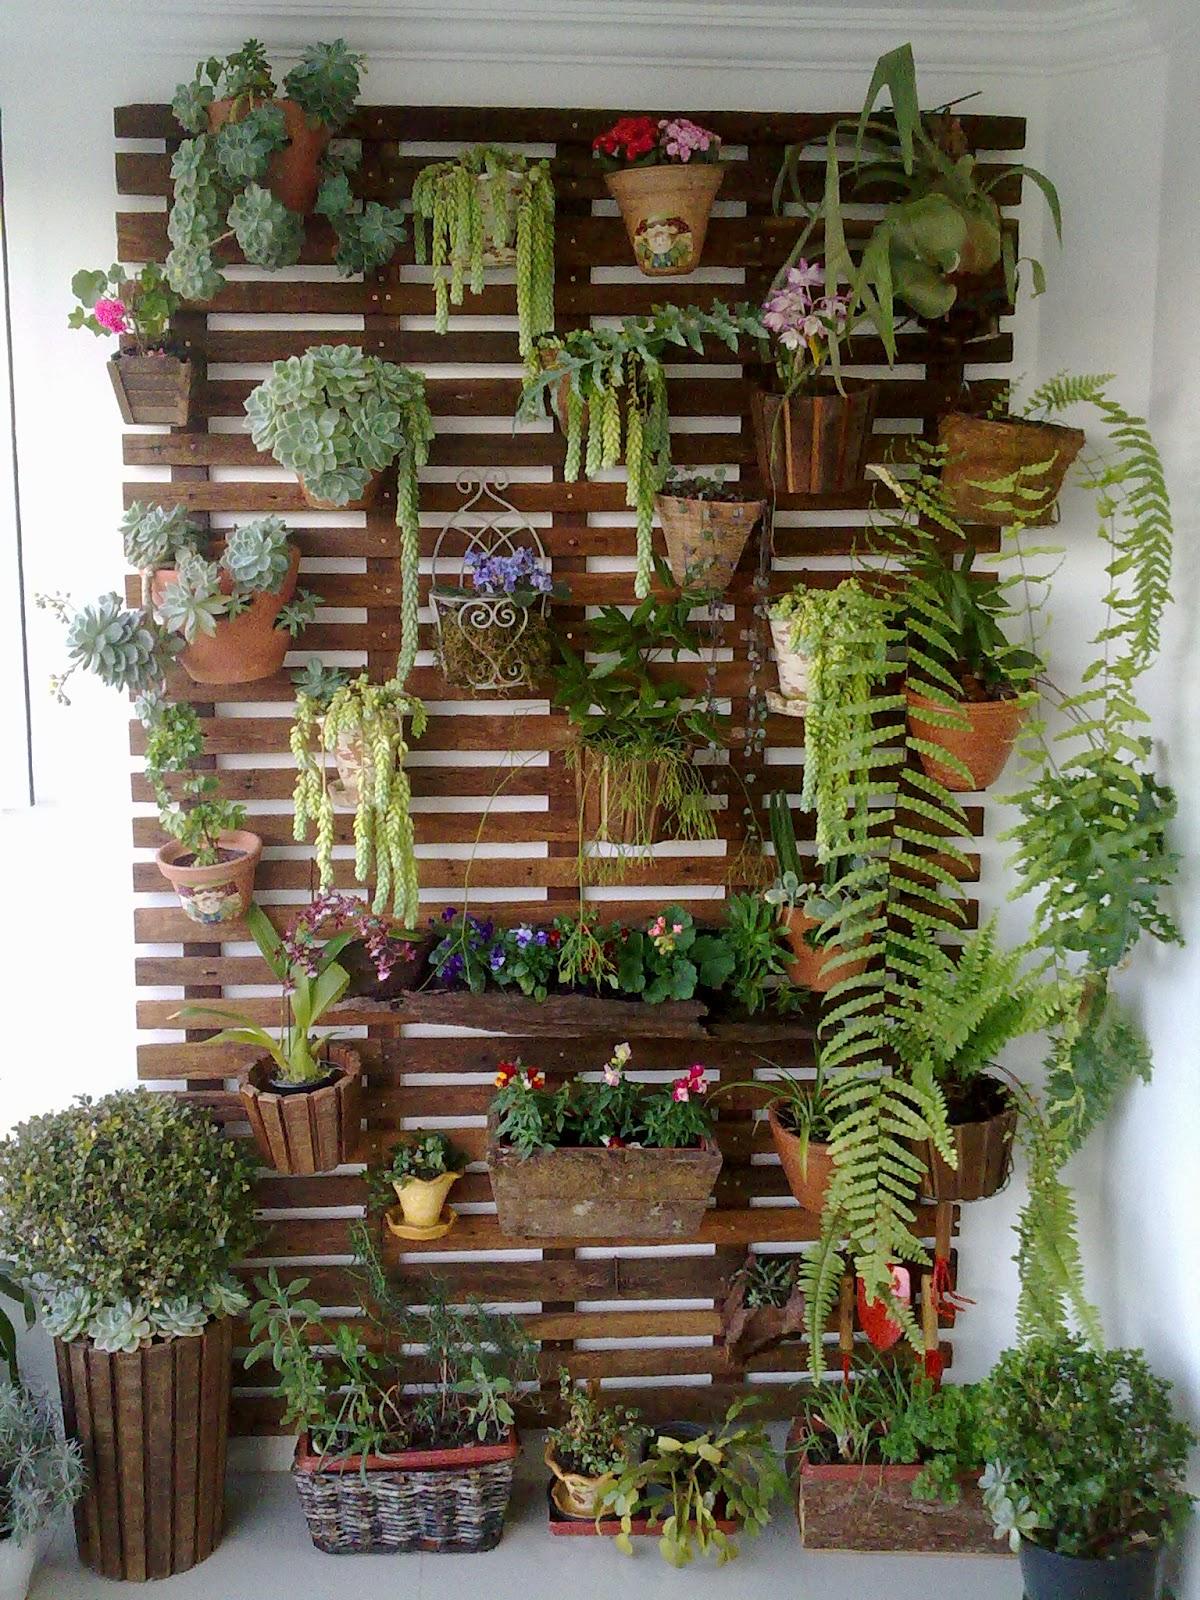 jardim vertical moderno:15 Modelos de Jardins verticais